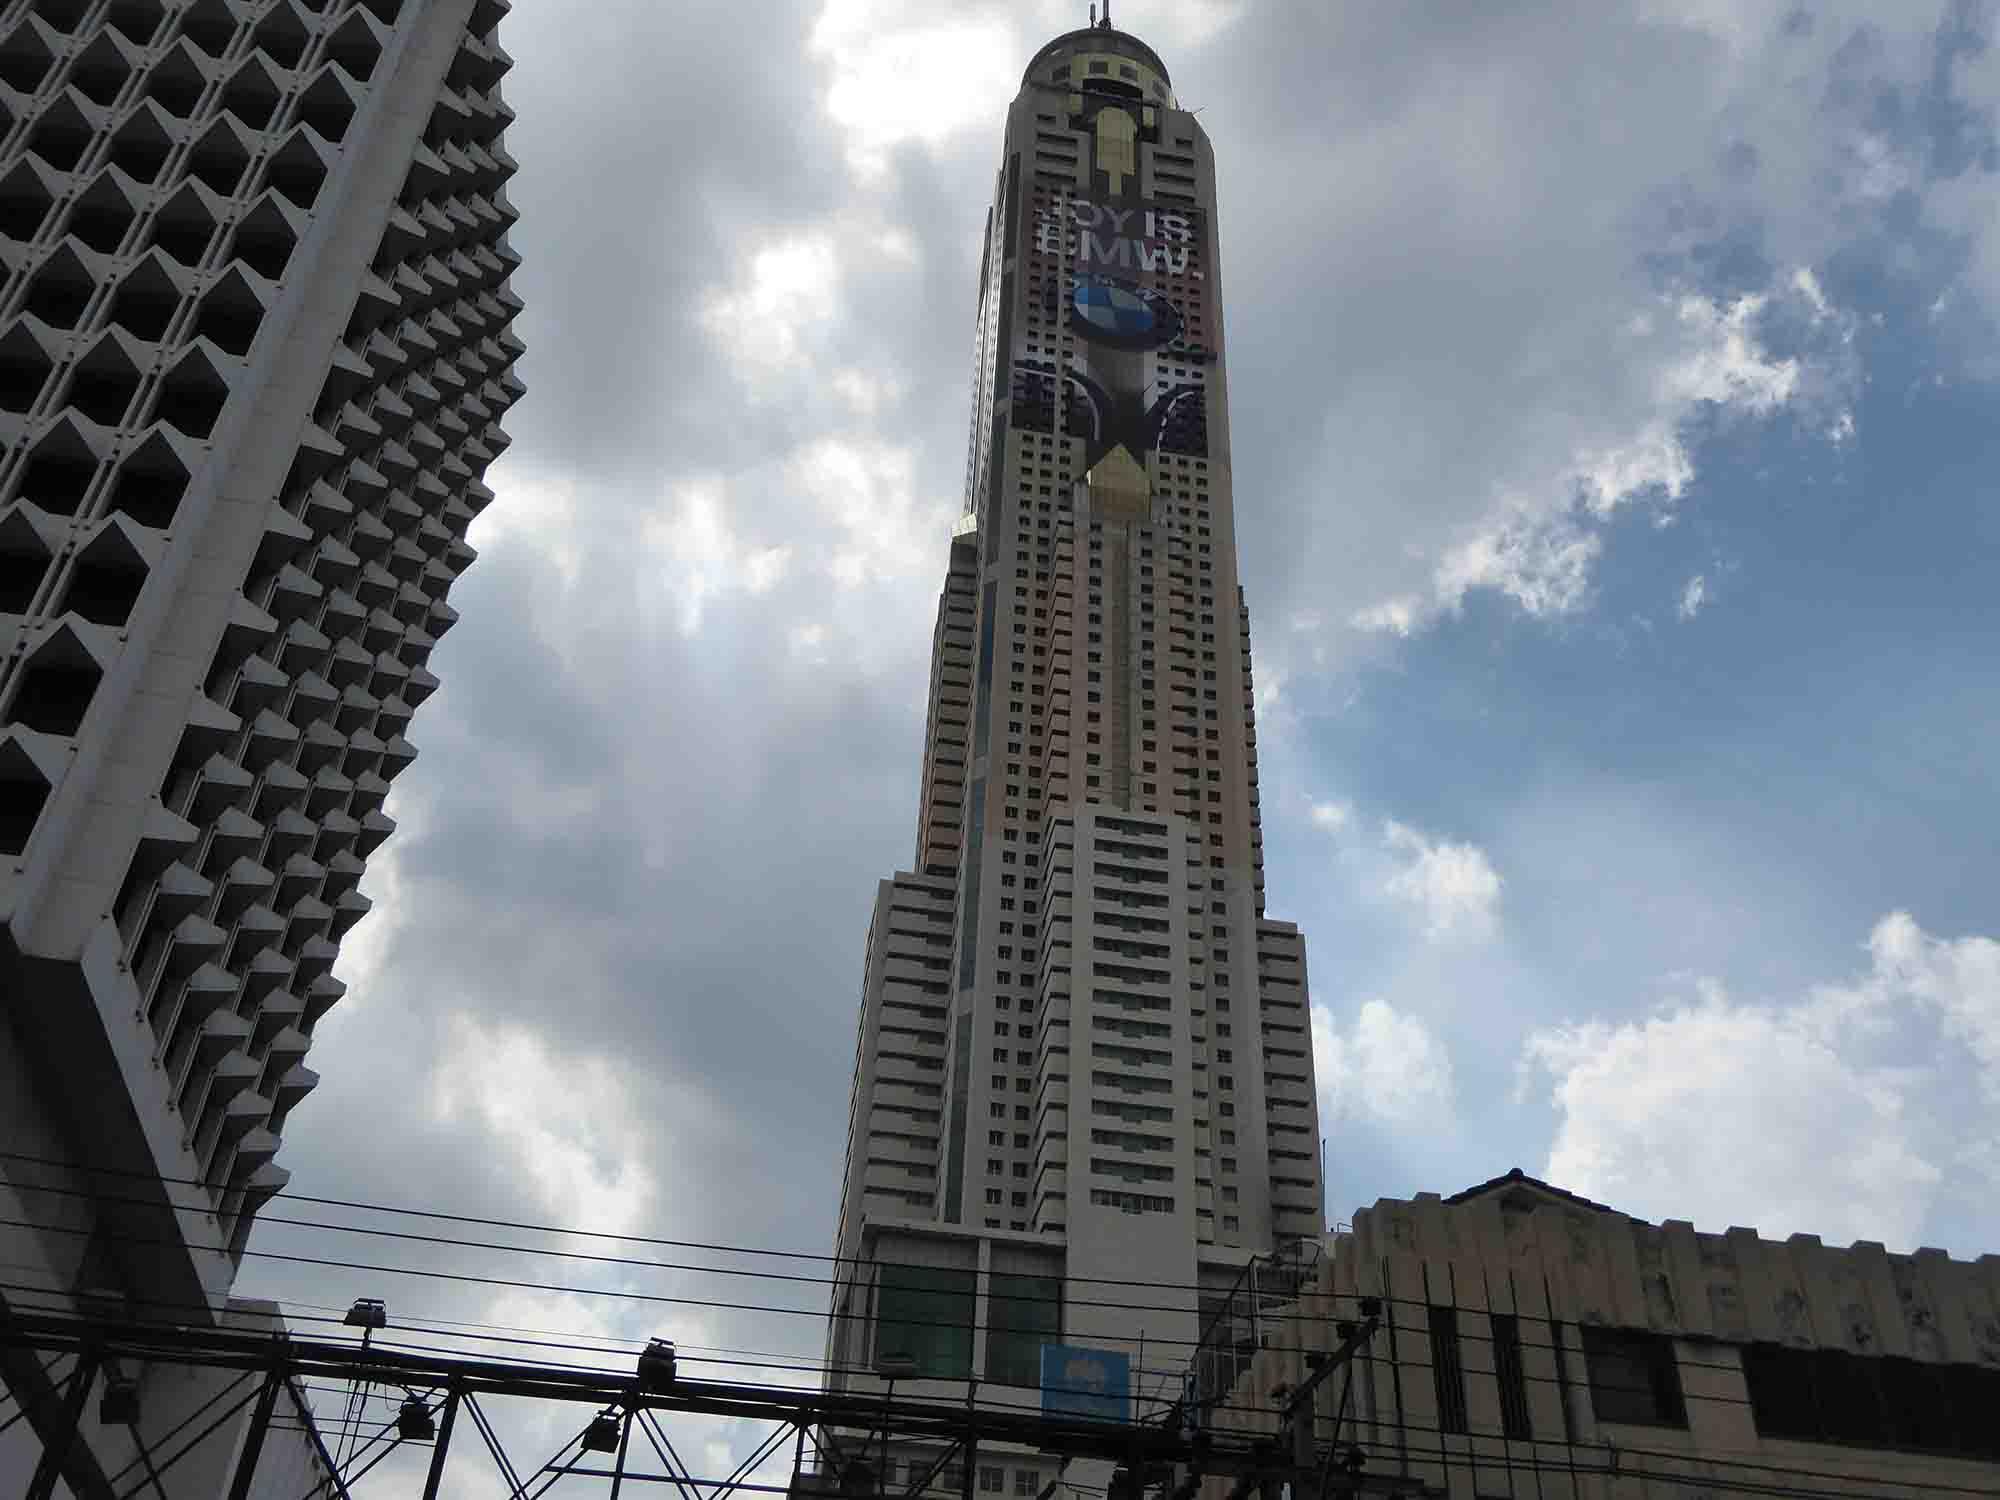 P1150135 - Landmarks & Monuments